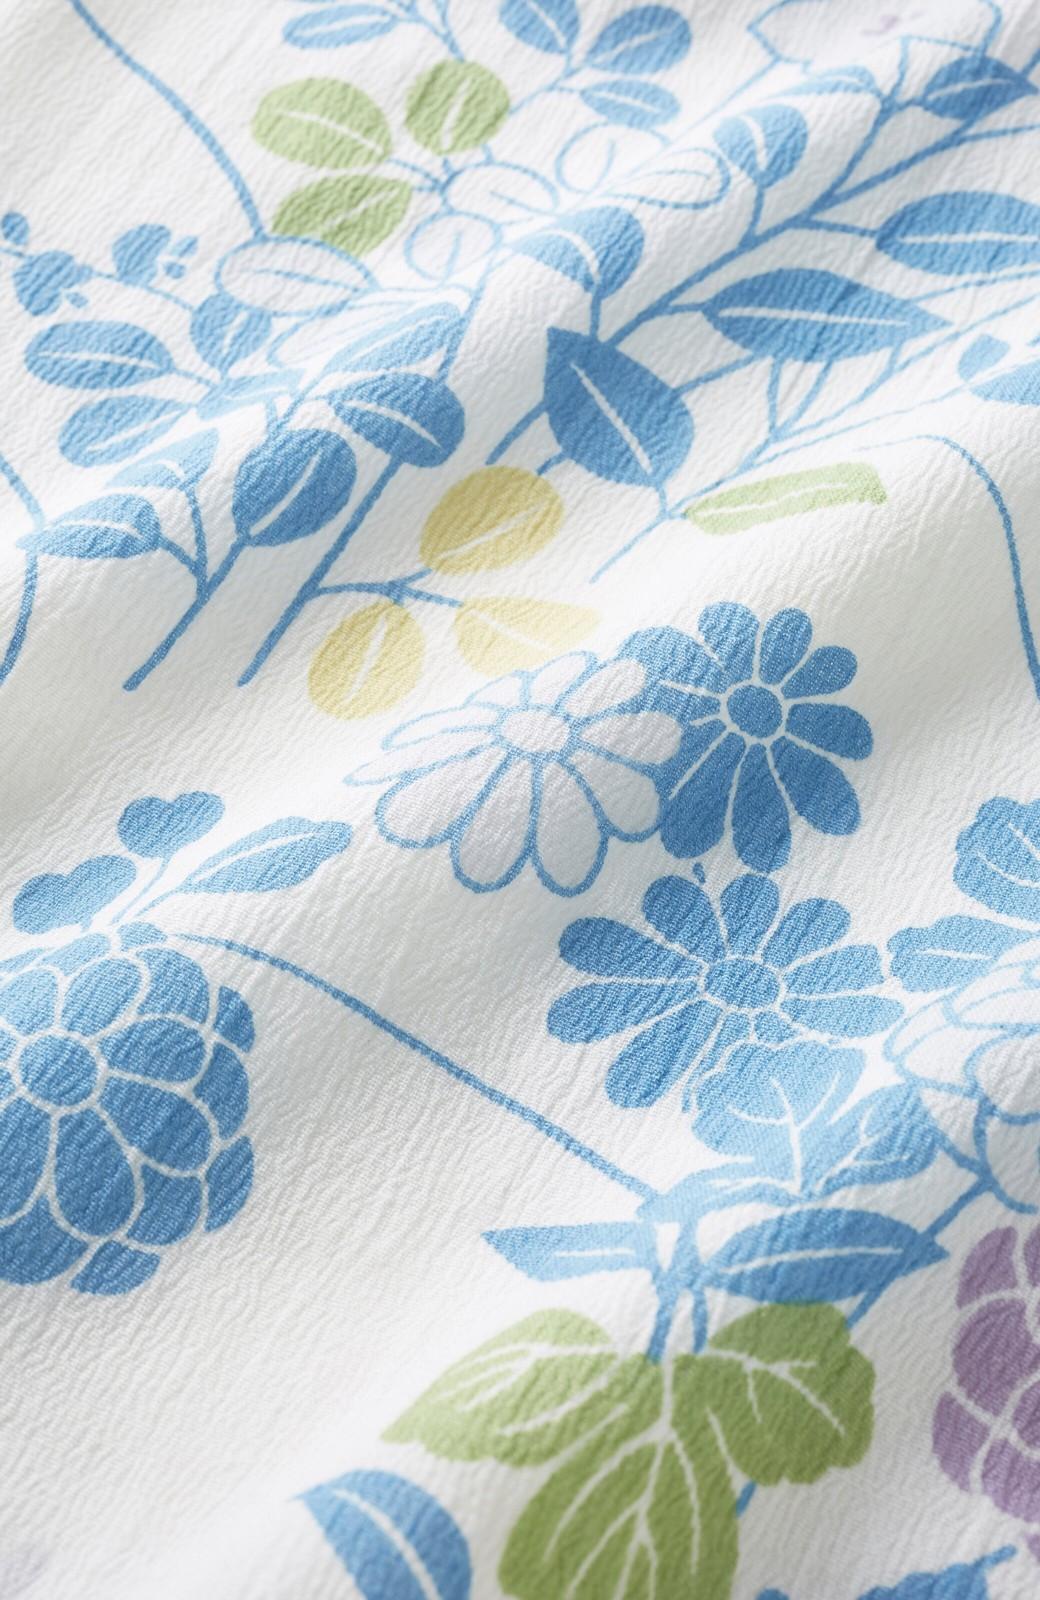 haco! ひでや工房 京都の綿ちりめん浴衣 <サックスブルー>の商品写真3